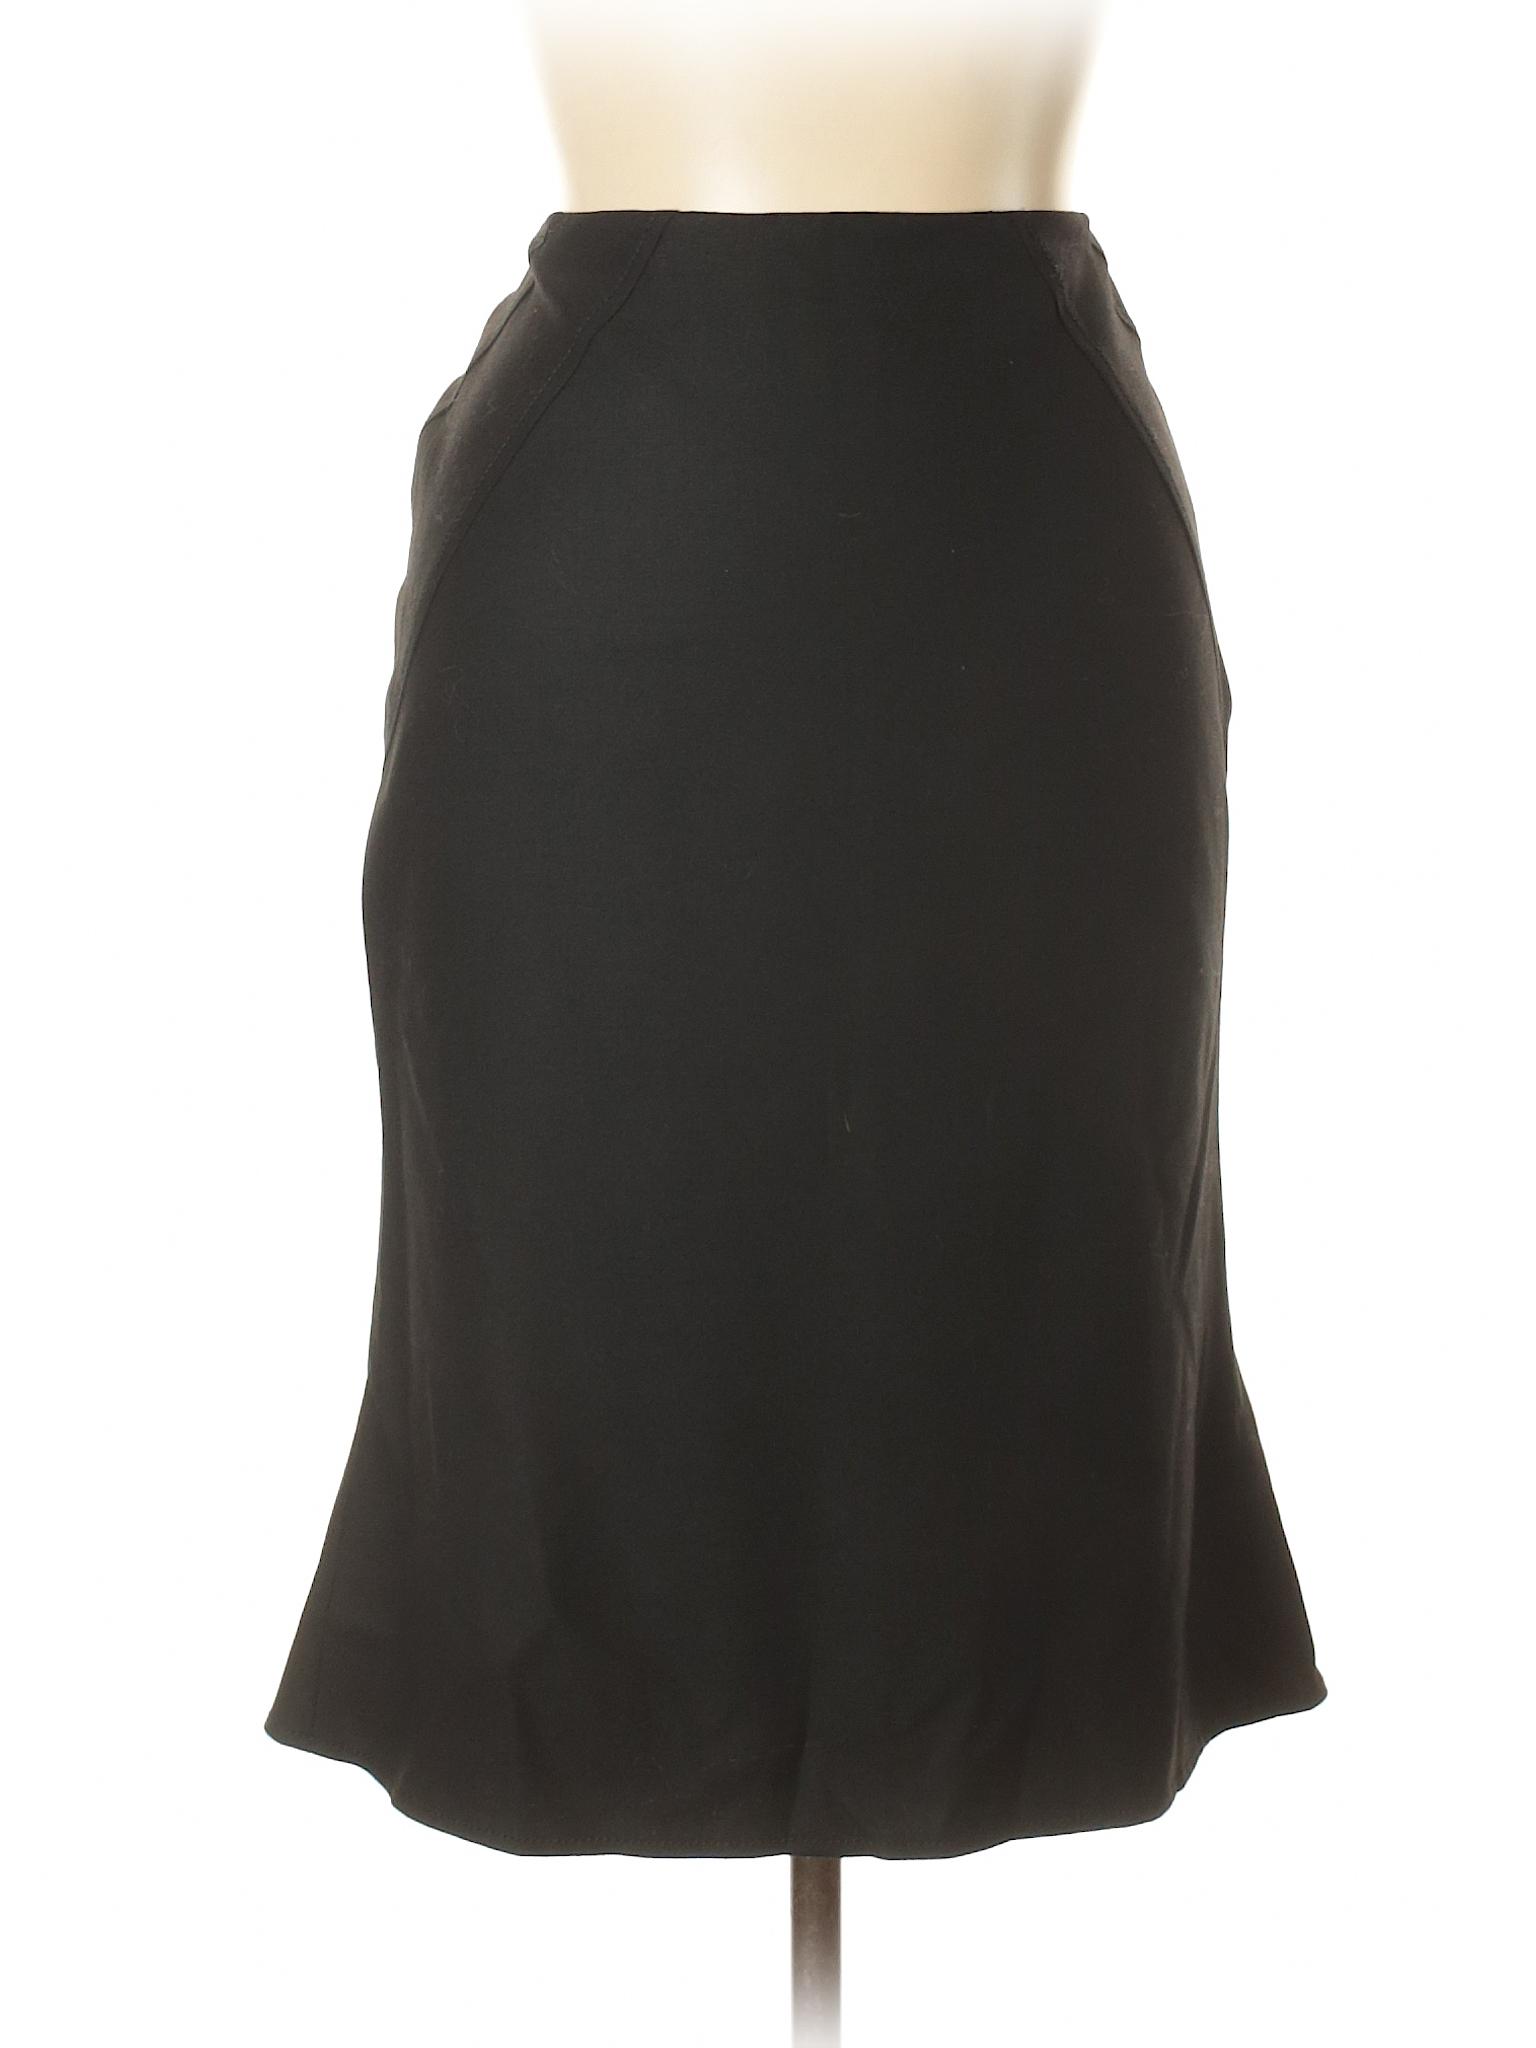 Boutique Boutique Casual Casual Boutique Casual Skirt Casual Skirt Skirt Boutique Skirt Skirt Casual Boutique Boutique zzpx5Arq